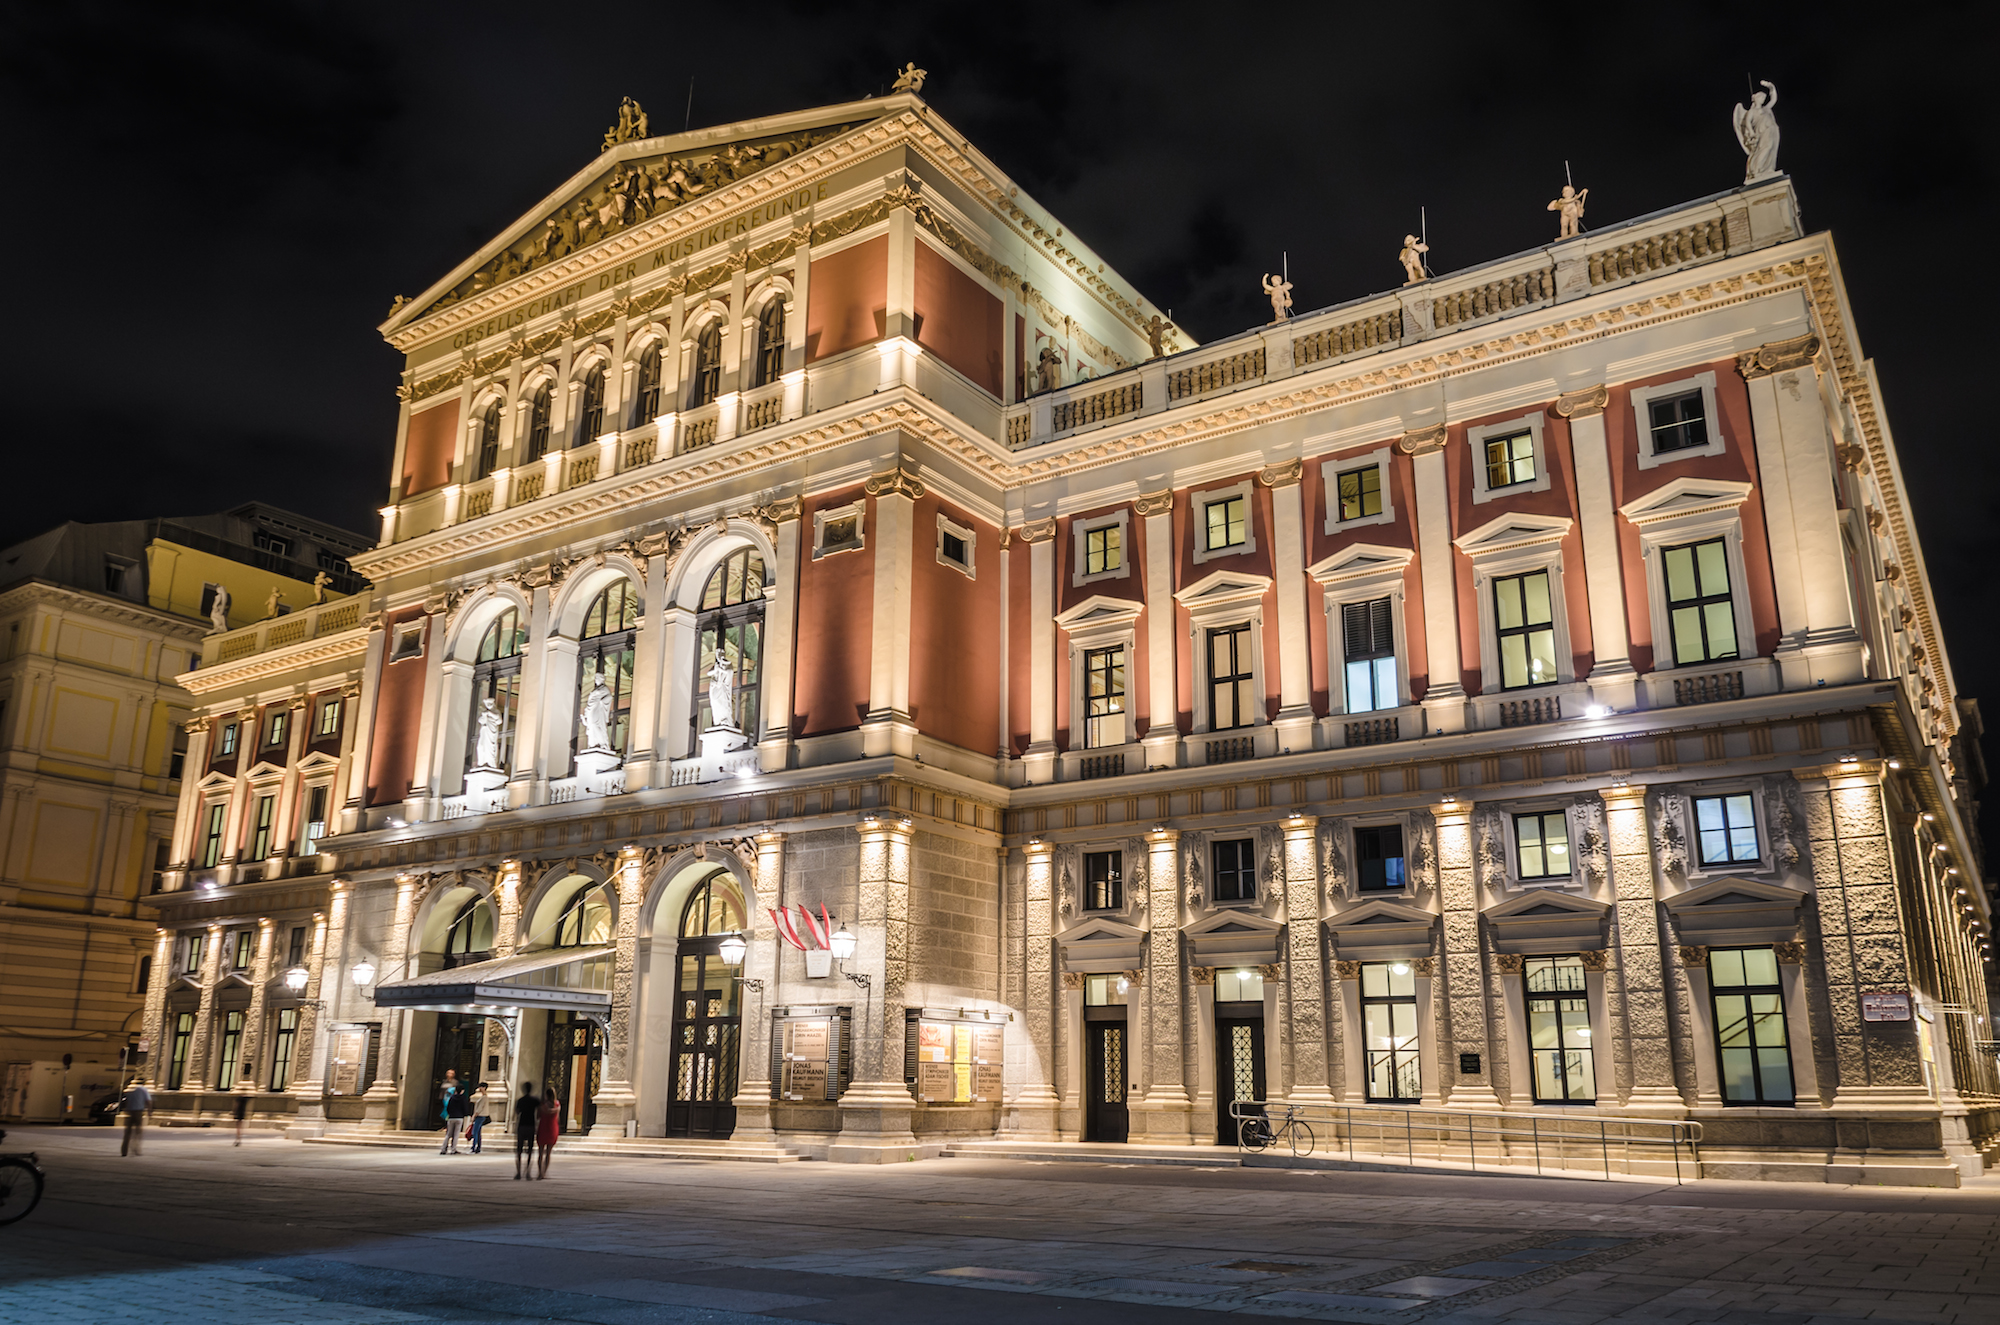 Венская филармония Мюзикферайн / Musikverein